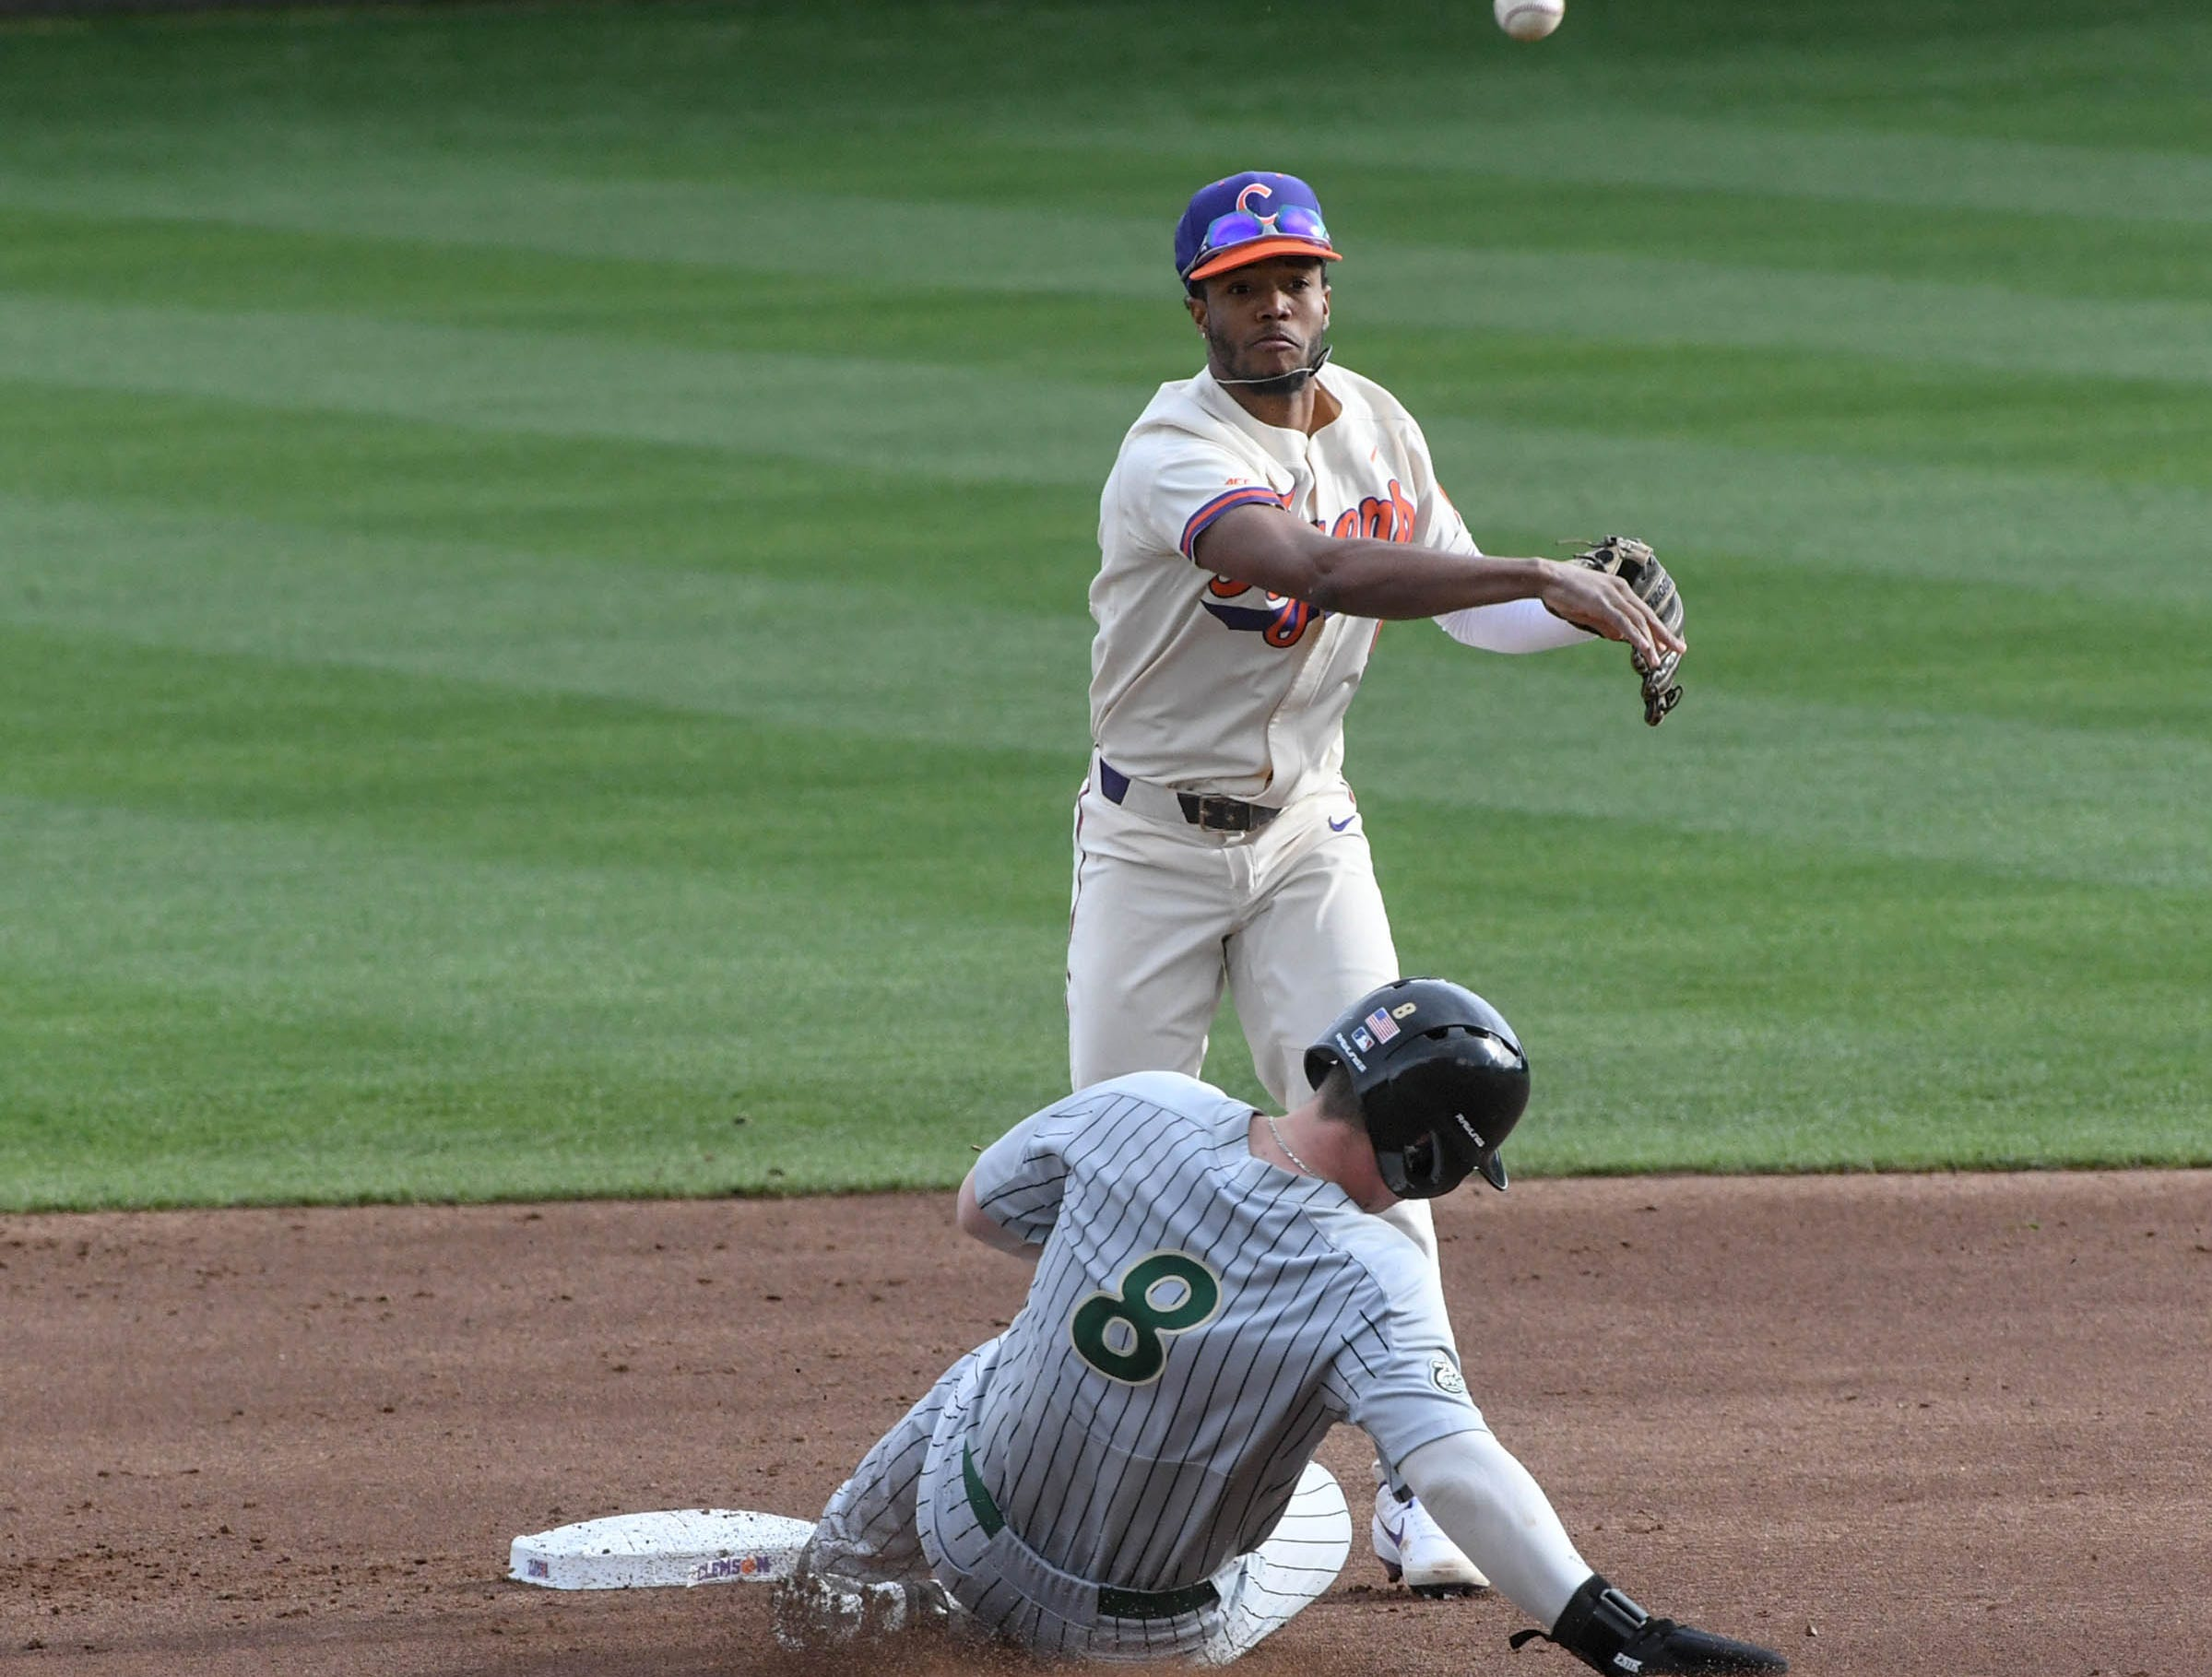 Clemson infielder Jordan Greene(9) turns a double play near Charlotte senior Harris Yett(8) during the top of the first inning at Doug Kingsmore Stadium in Clemson Monday, February 18, 2019.